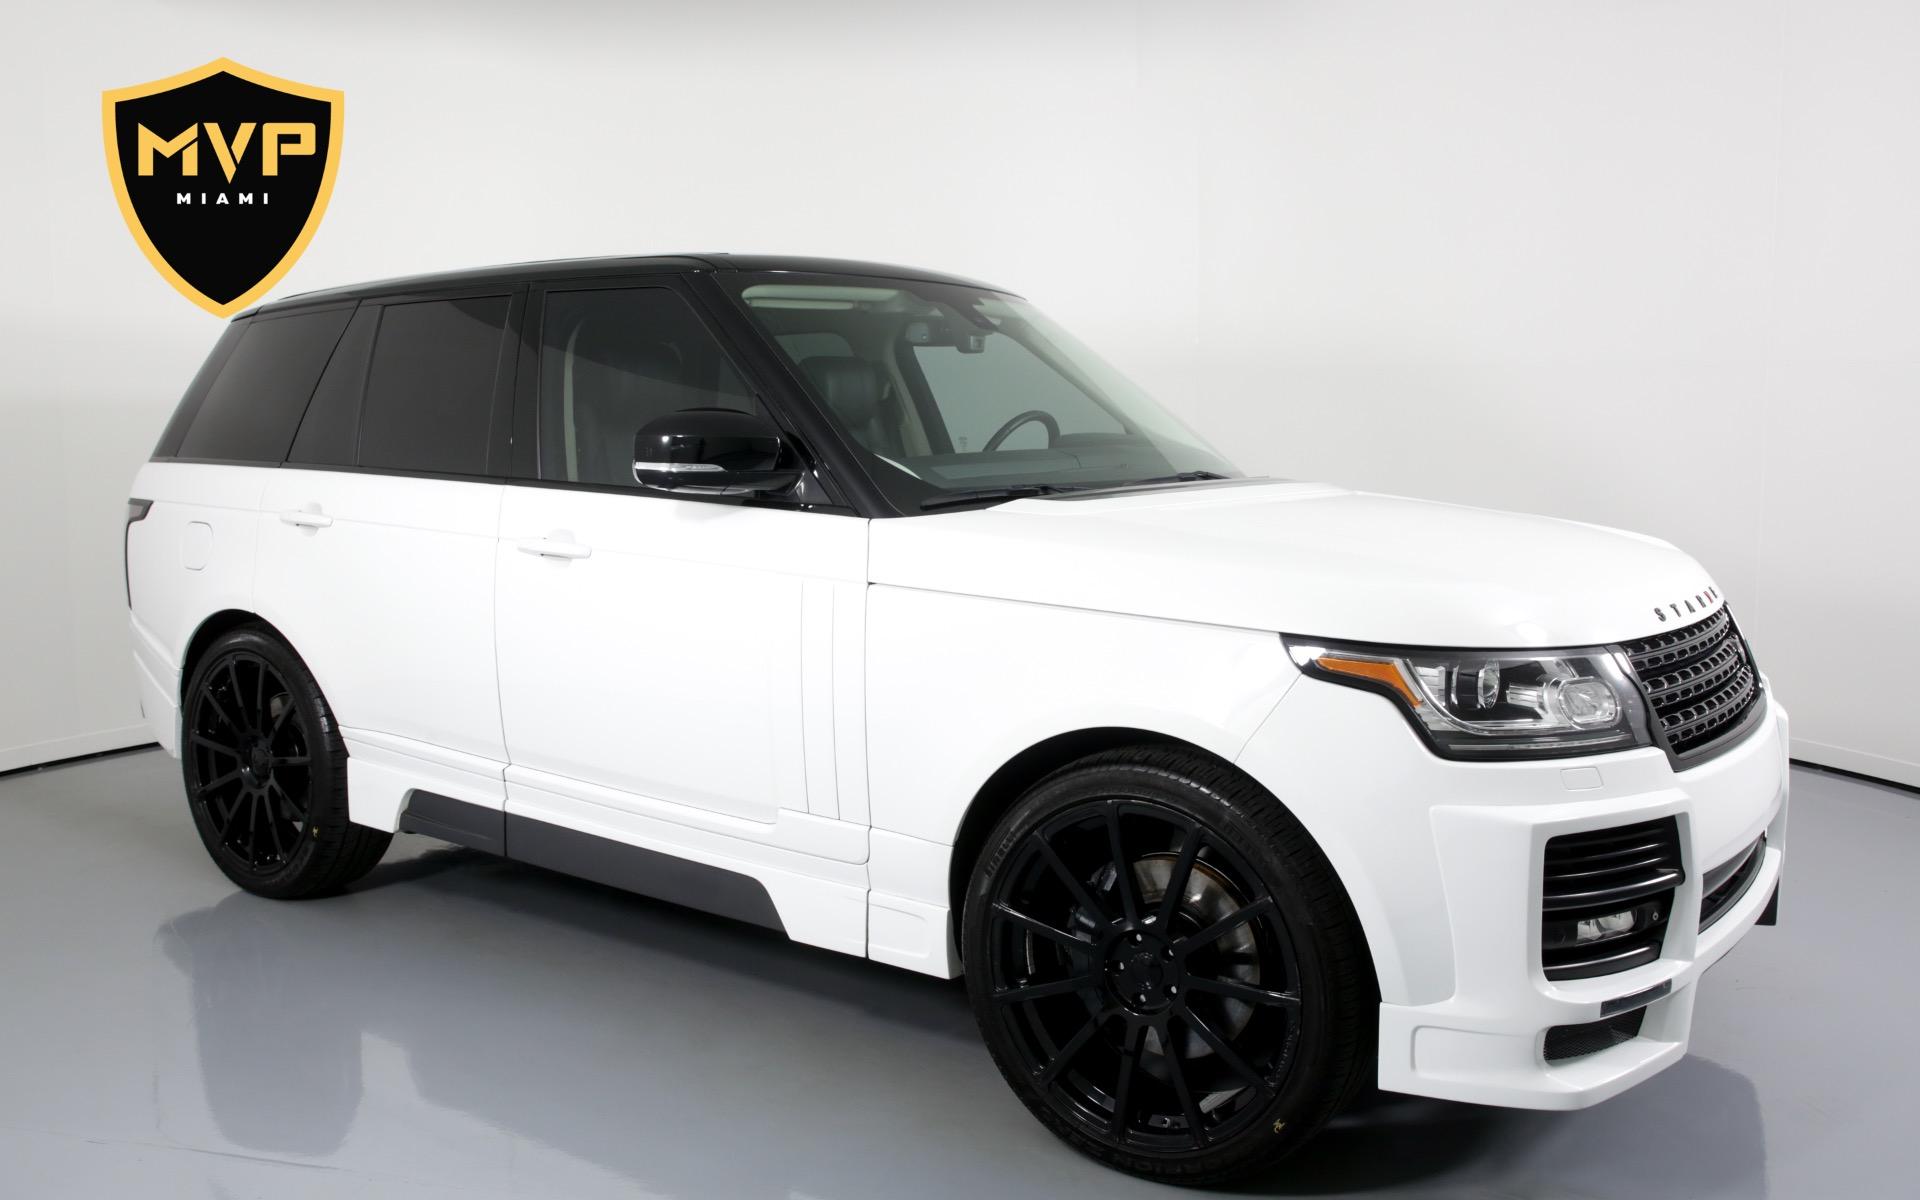 0 Land Rover Range Rover for sale $375 at MVP Miami in Miami FL 33142 1